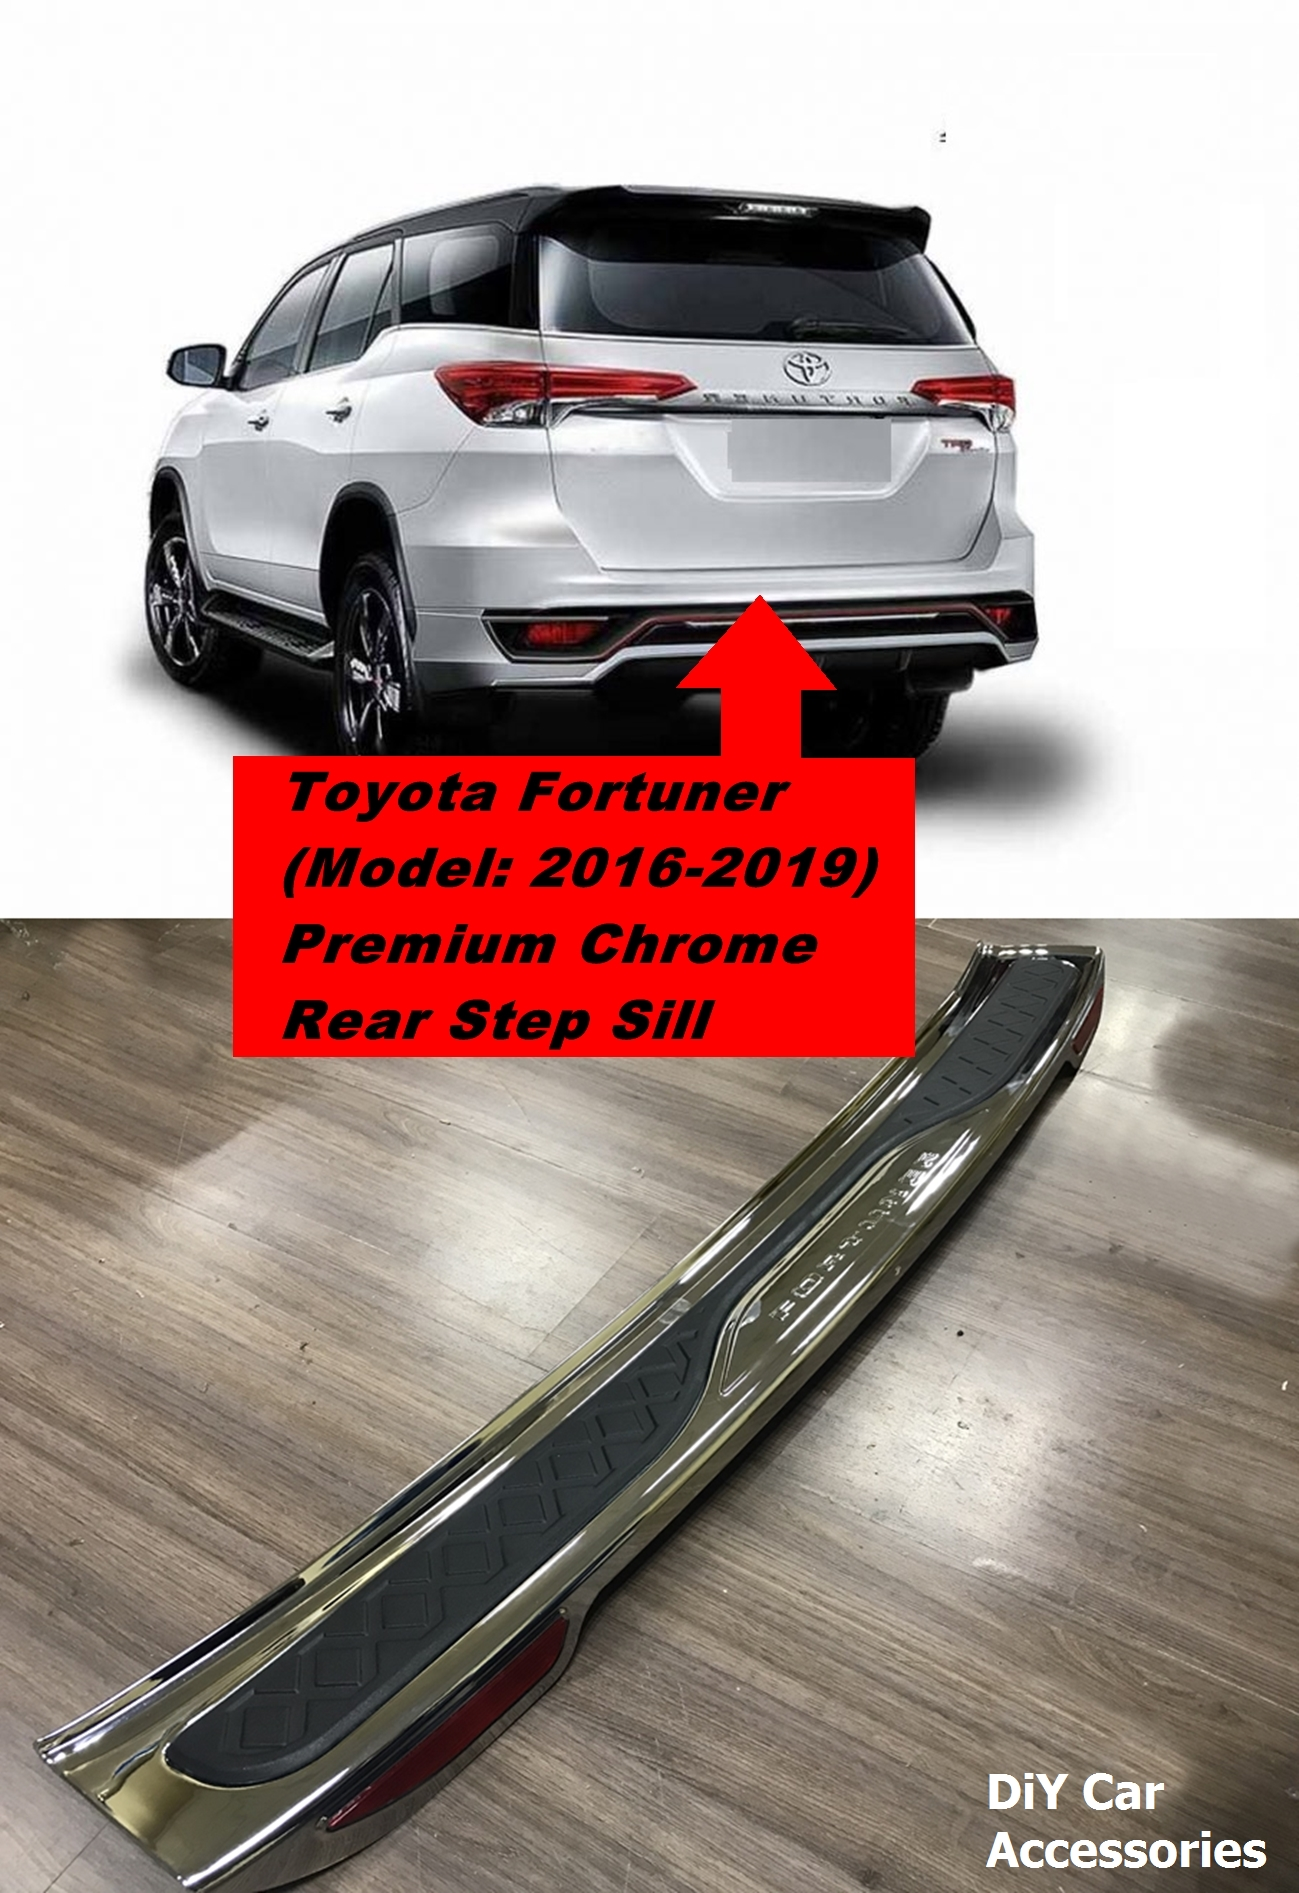 Toyota Fortuner Premium Chrome Rear Bumper Step Sill (2016-2019)